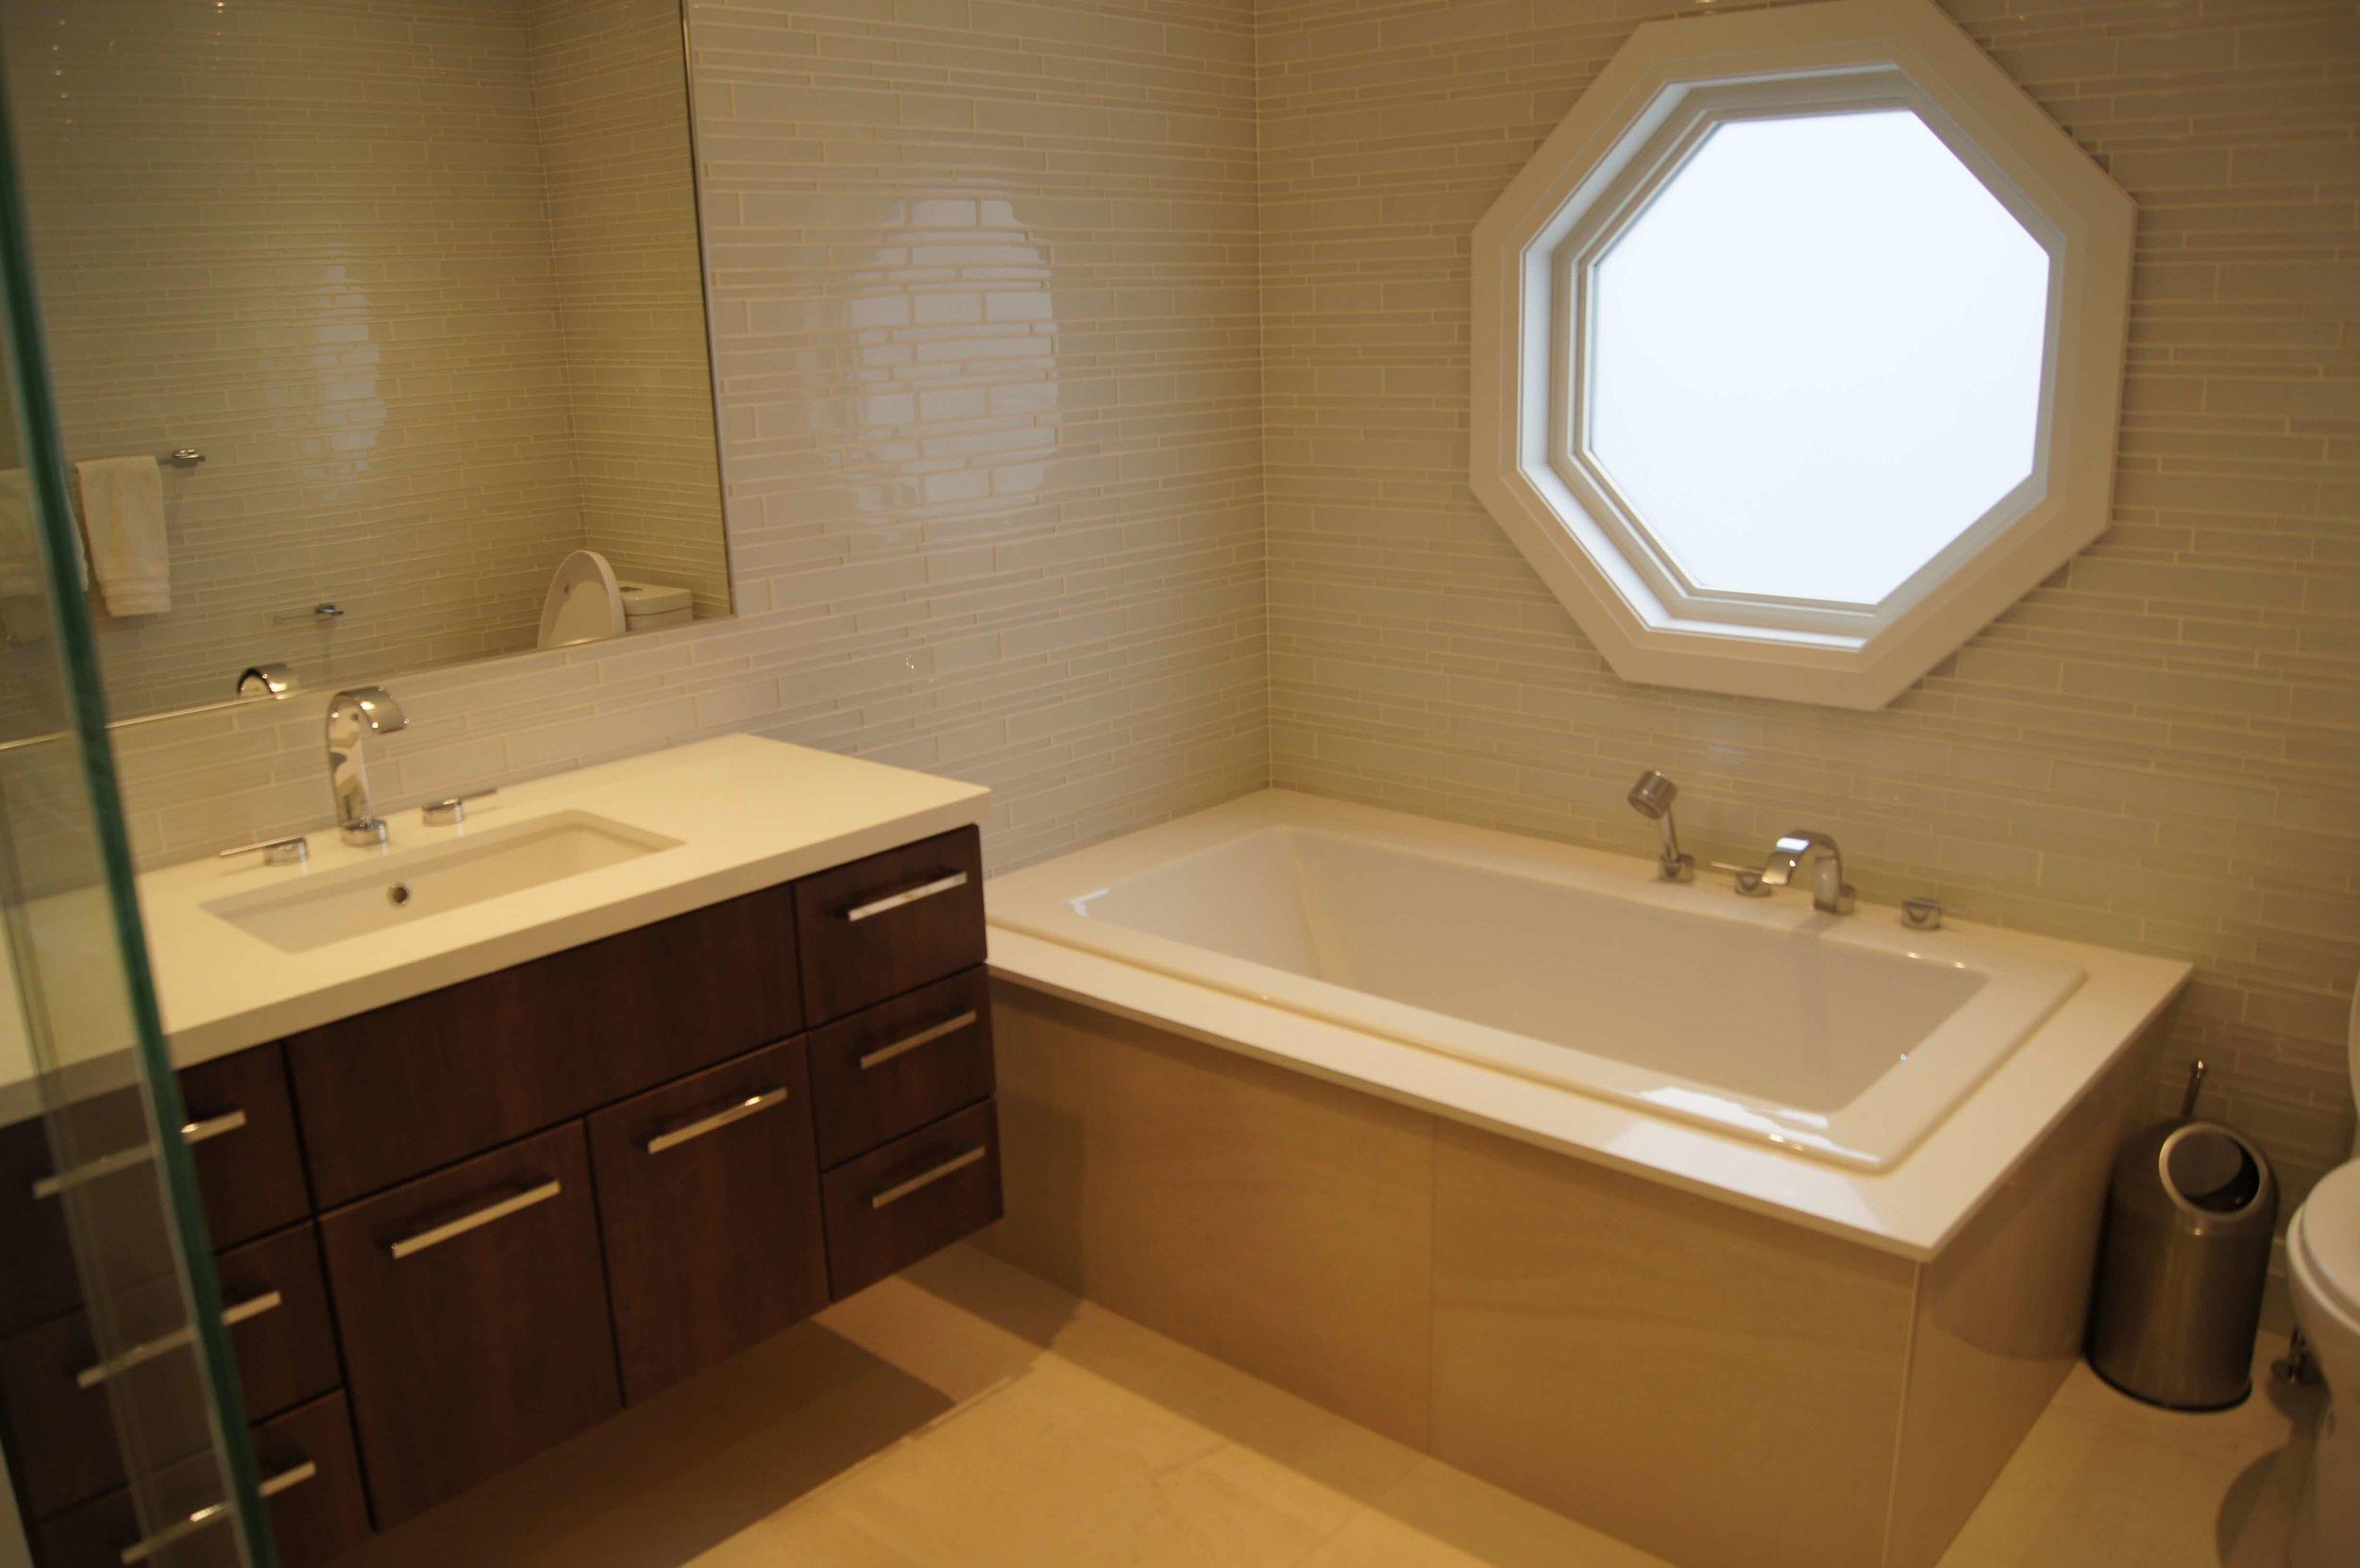 bathroom-renovation-ideas-window.JPG